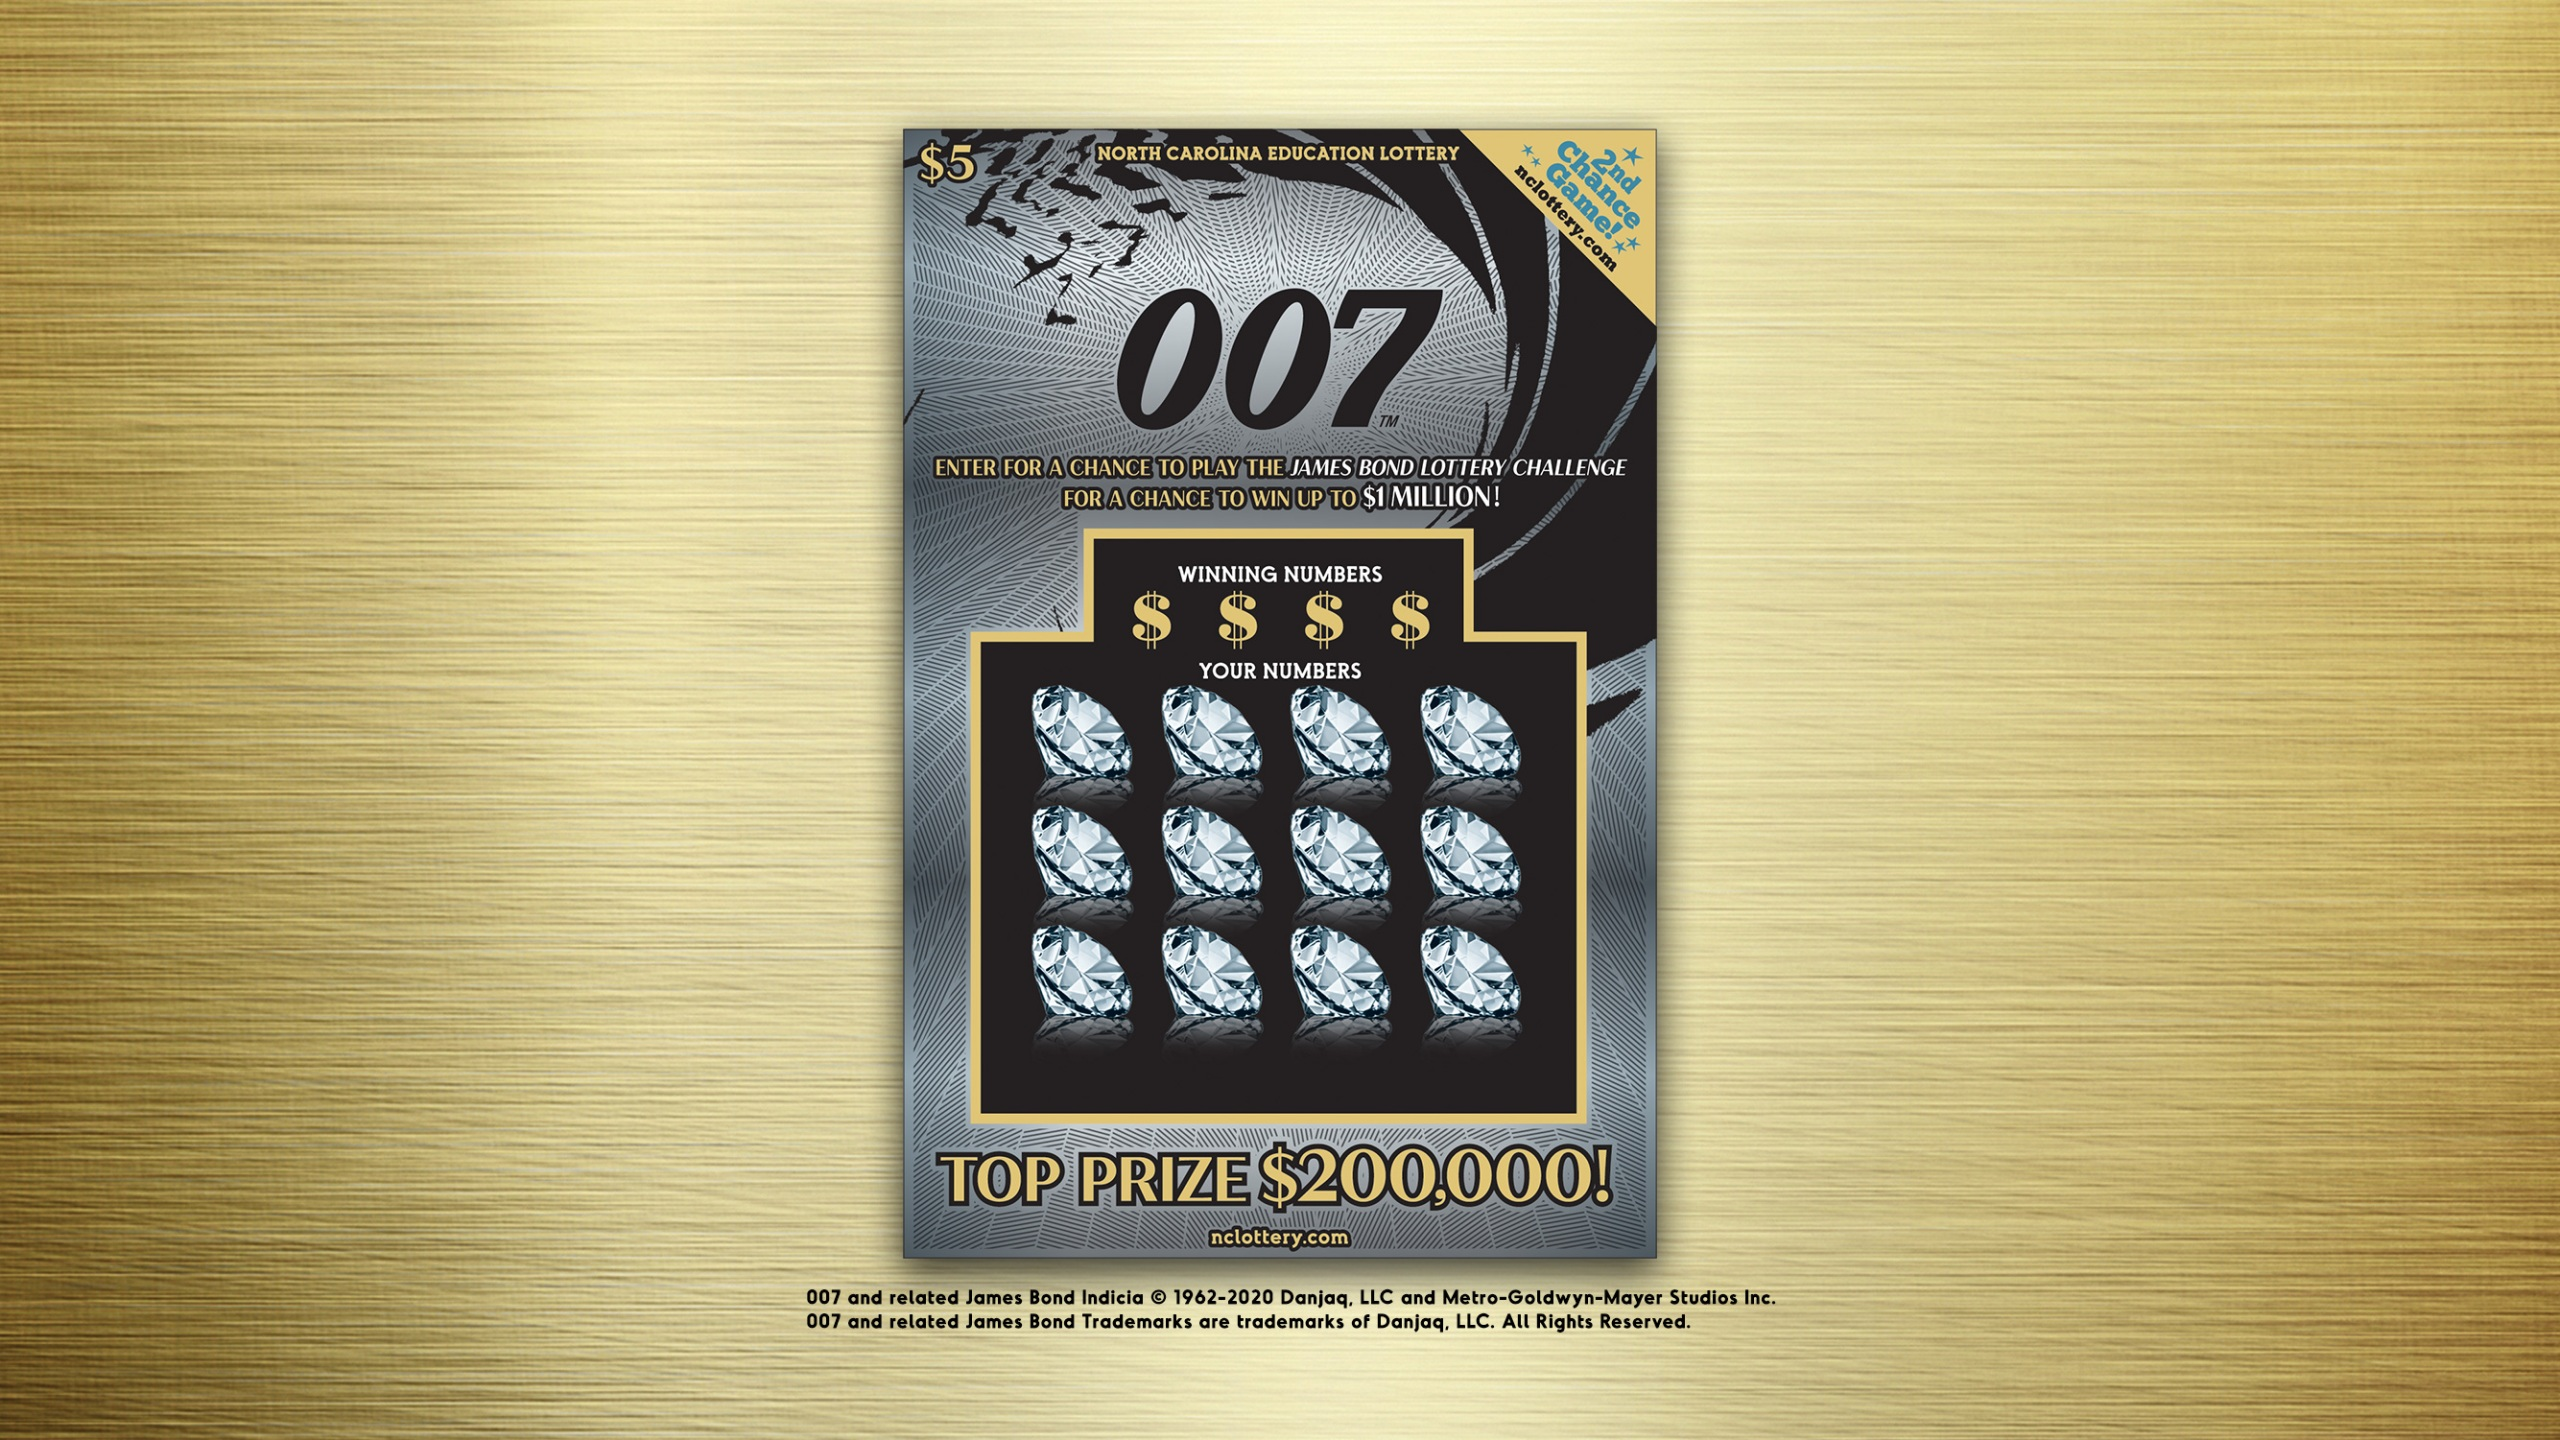 James Bond 007 lottery ticket